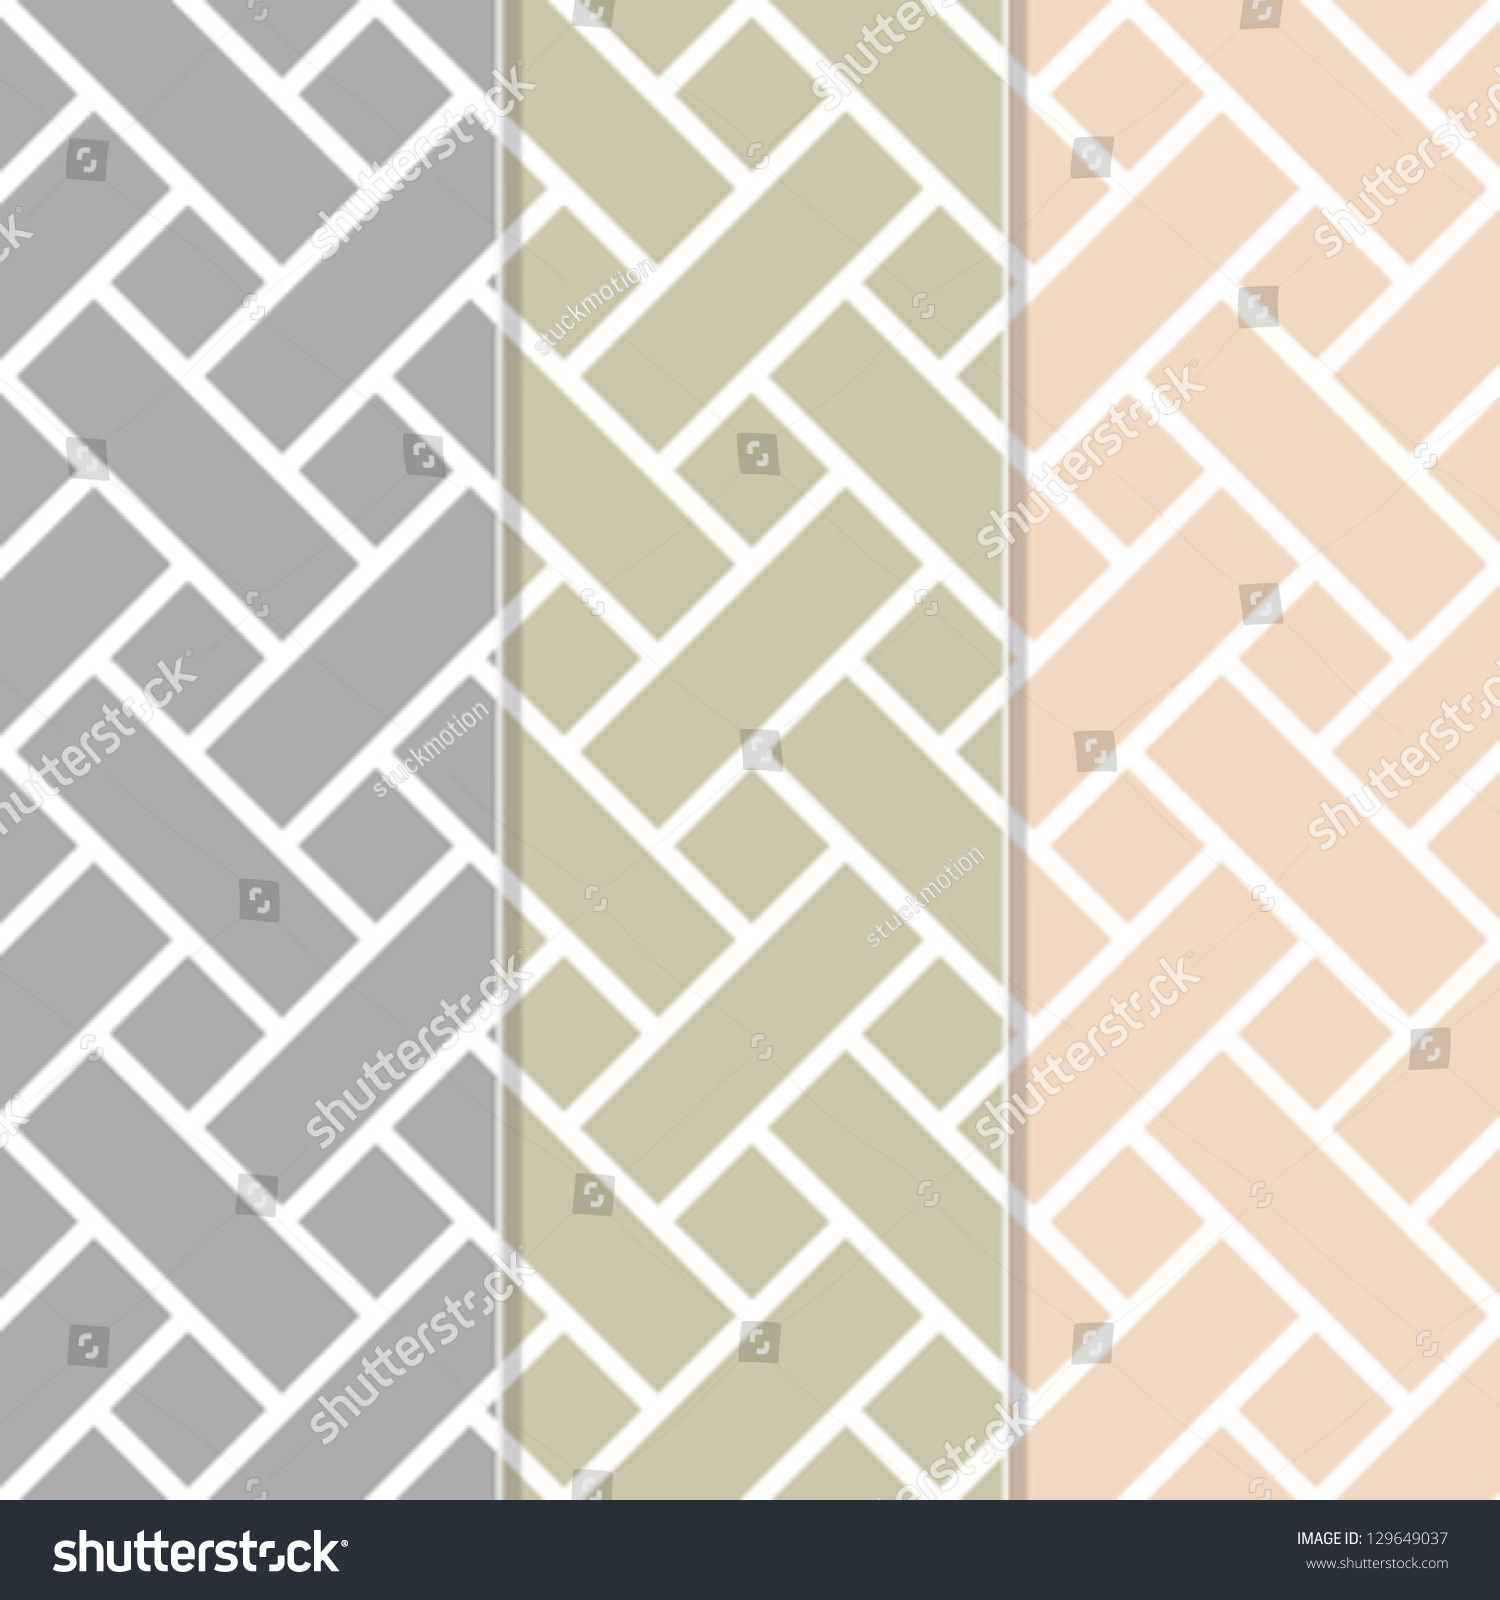 Basket weave brick pattern - Seamless Basket Weave Background Pattern